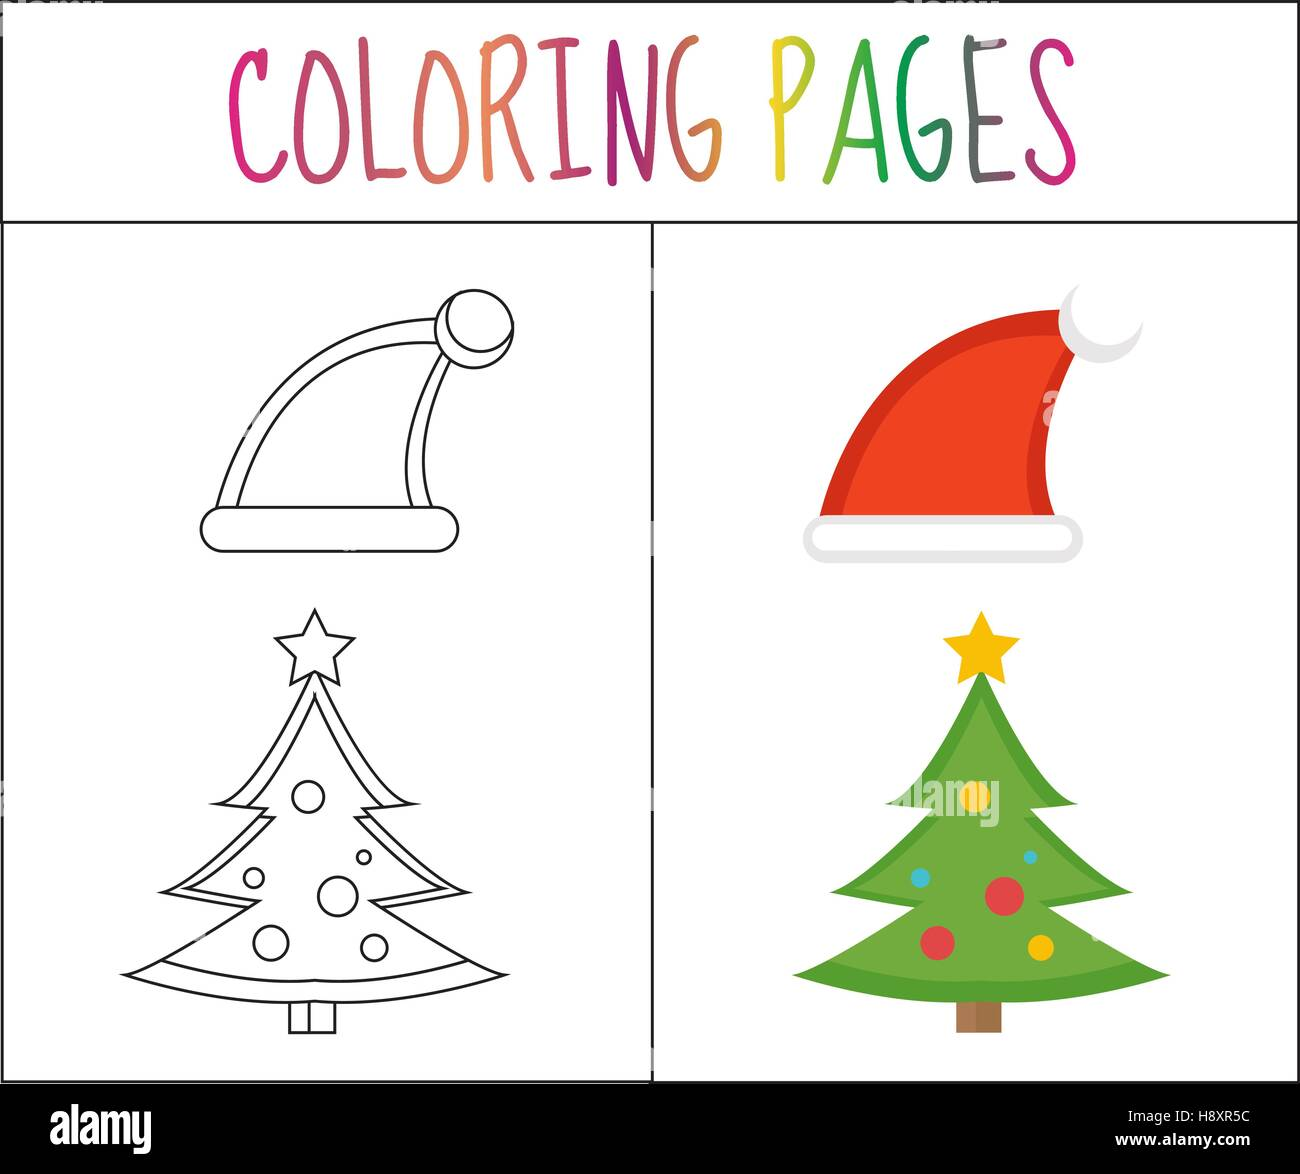 coloring book page christmas santa hats and tree sketch color version for kids vector illustration - Coloring Book Santa